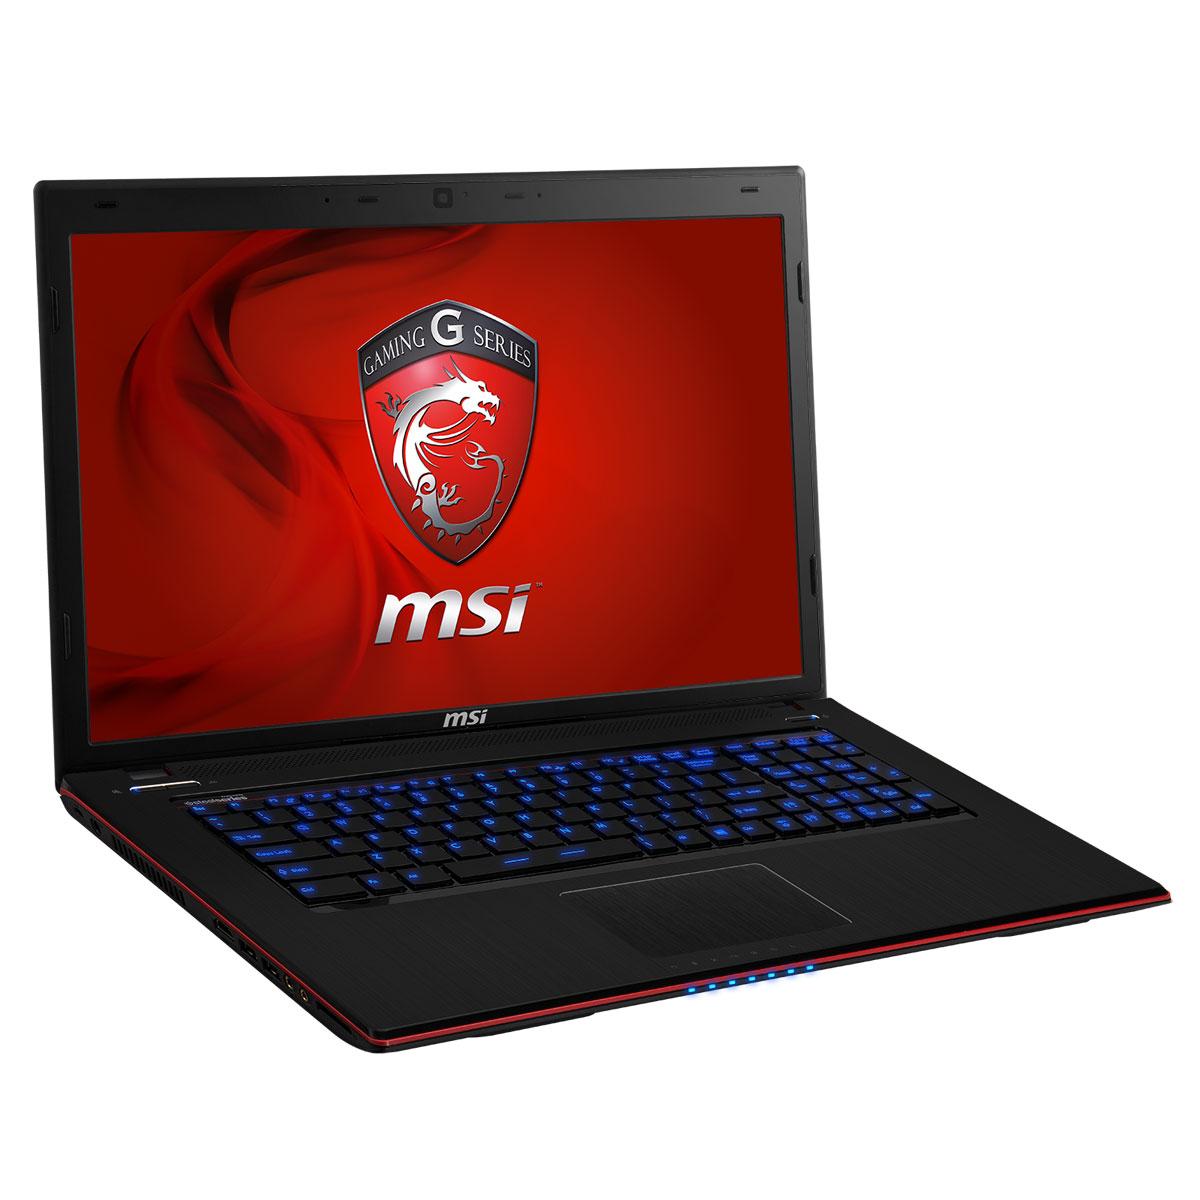 "PC portable MSI GE70 2OE-020FR Intel Core i7-4700MQ 8 Go 750 Go 17.3"" LED NVIDIA GeForce GTX 765M Lecteur Blu-ray/Graveur DVD Wi-Fi N/Bluetooth Webcam Windows 8 64 bits (garantie constructeur 2 ans)"